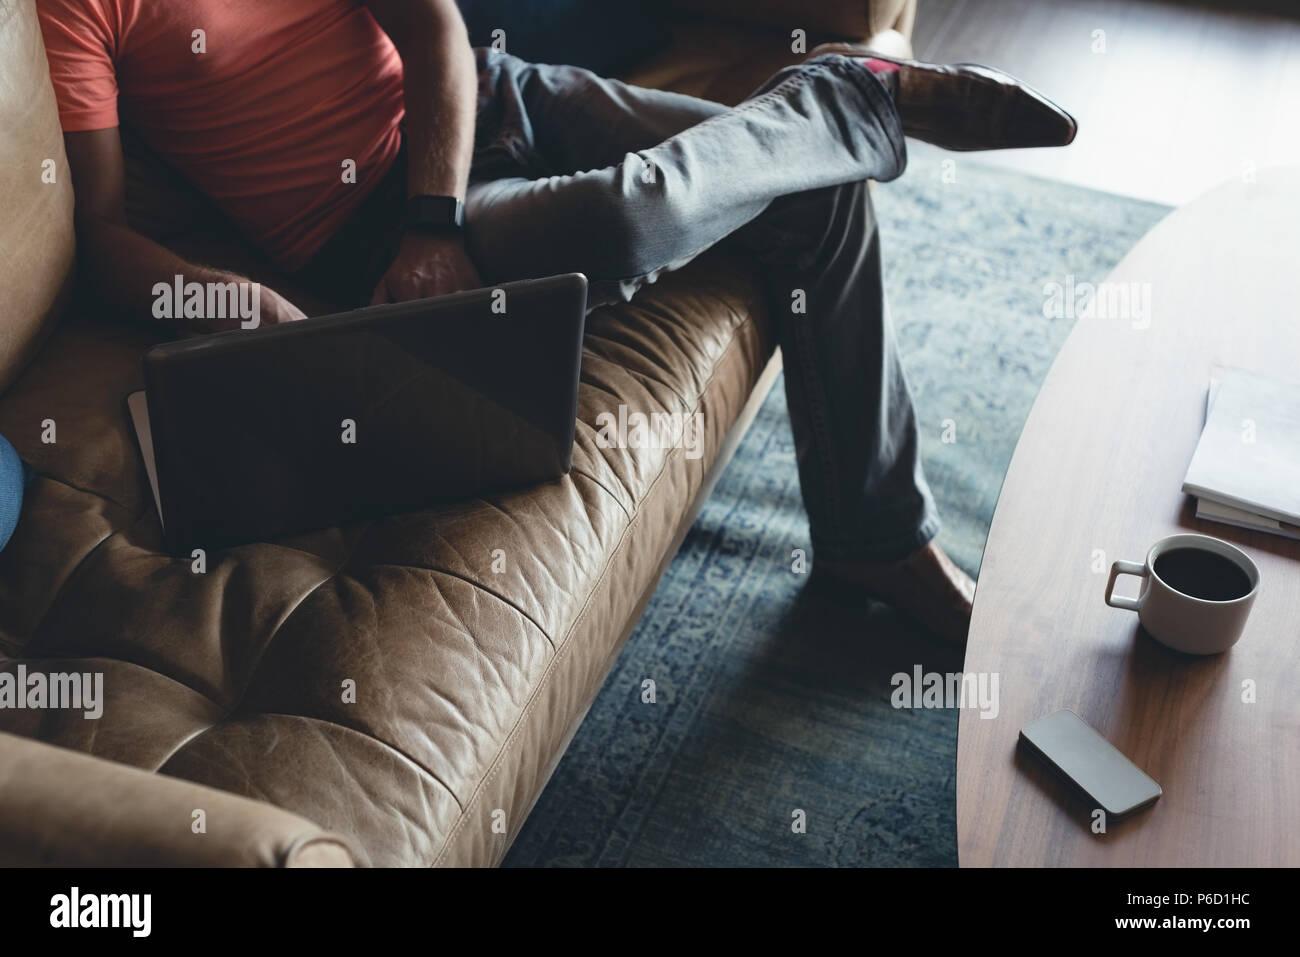 Businessman using laptop on a sofa Banque D'Images